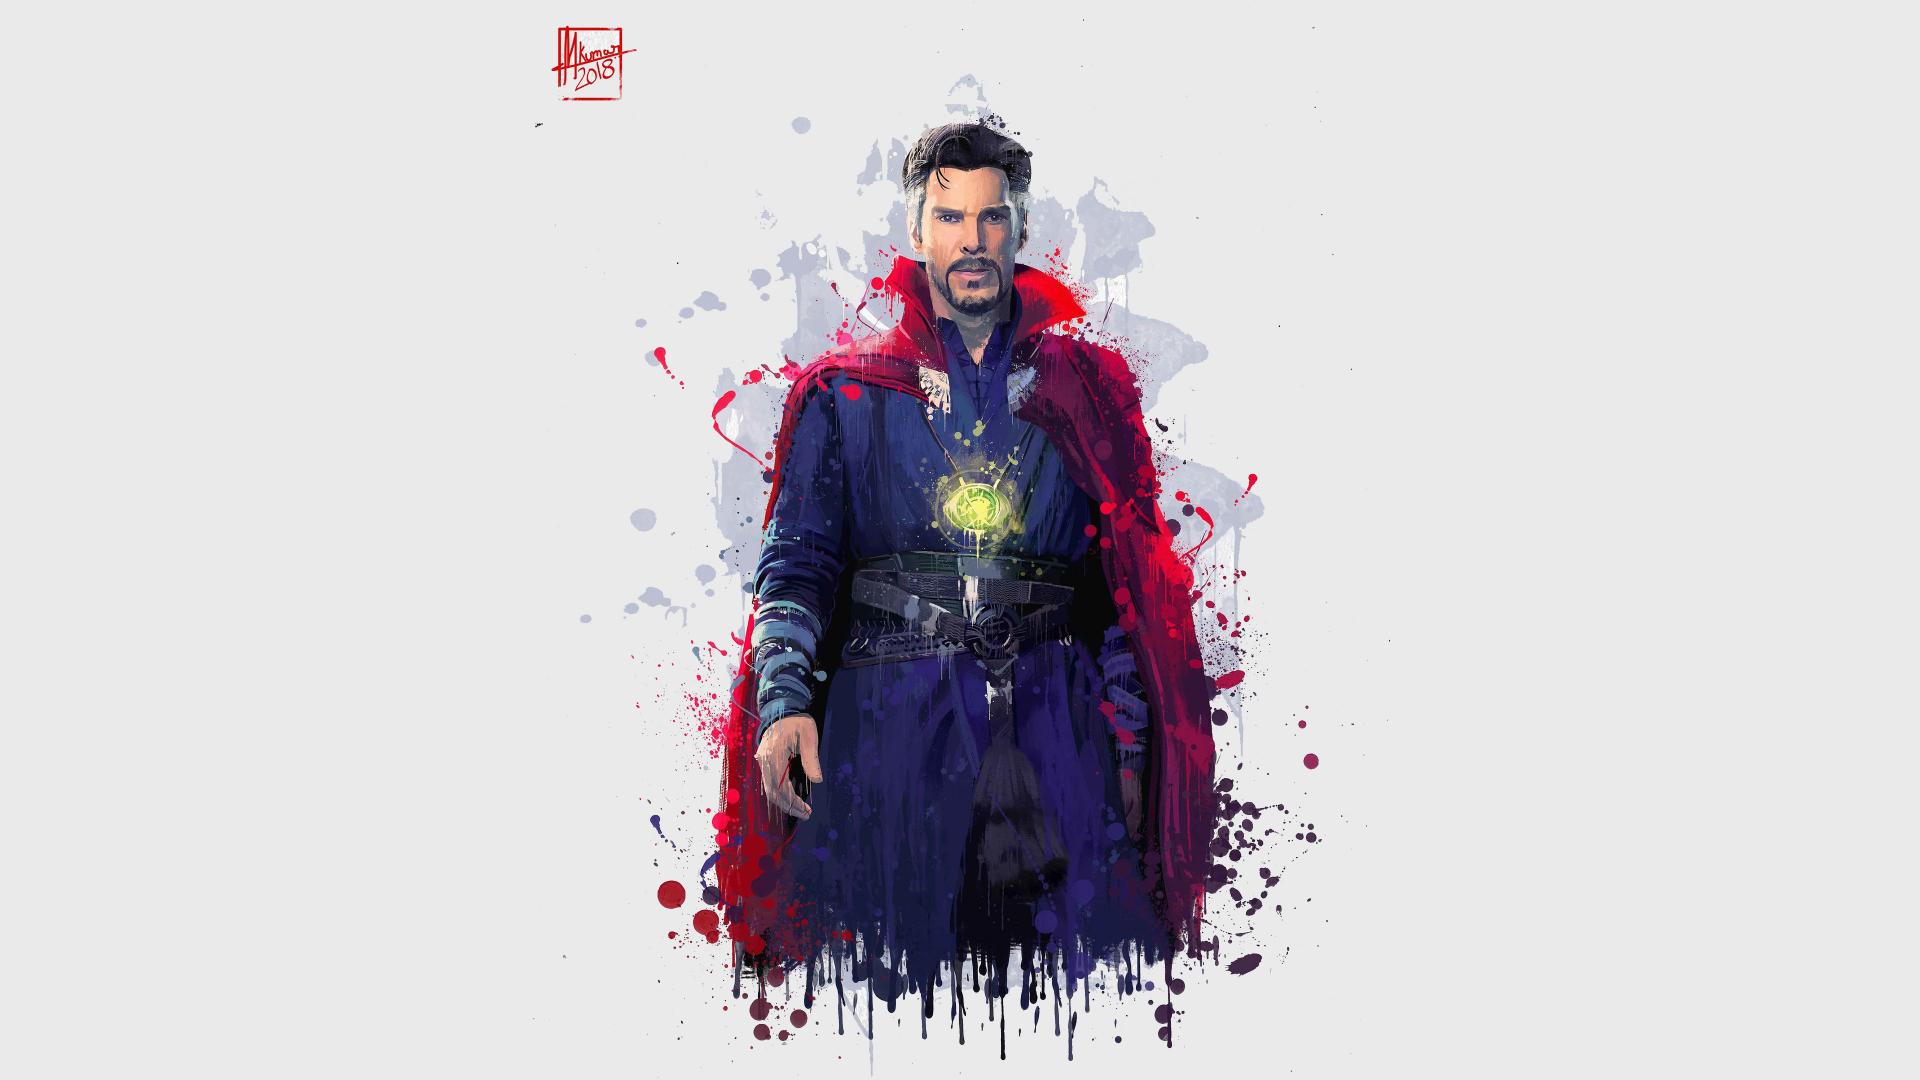 Download 1920x1080 Wallpaper Doctor Strange Avengers Infinity